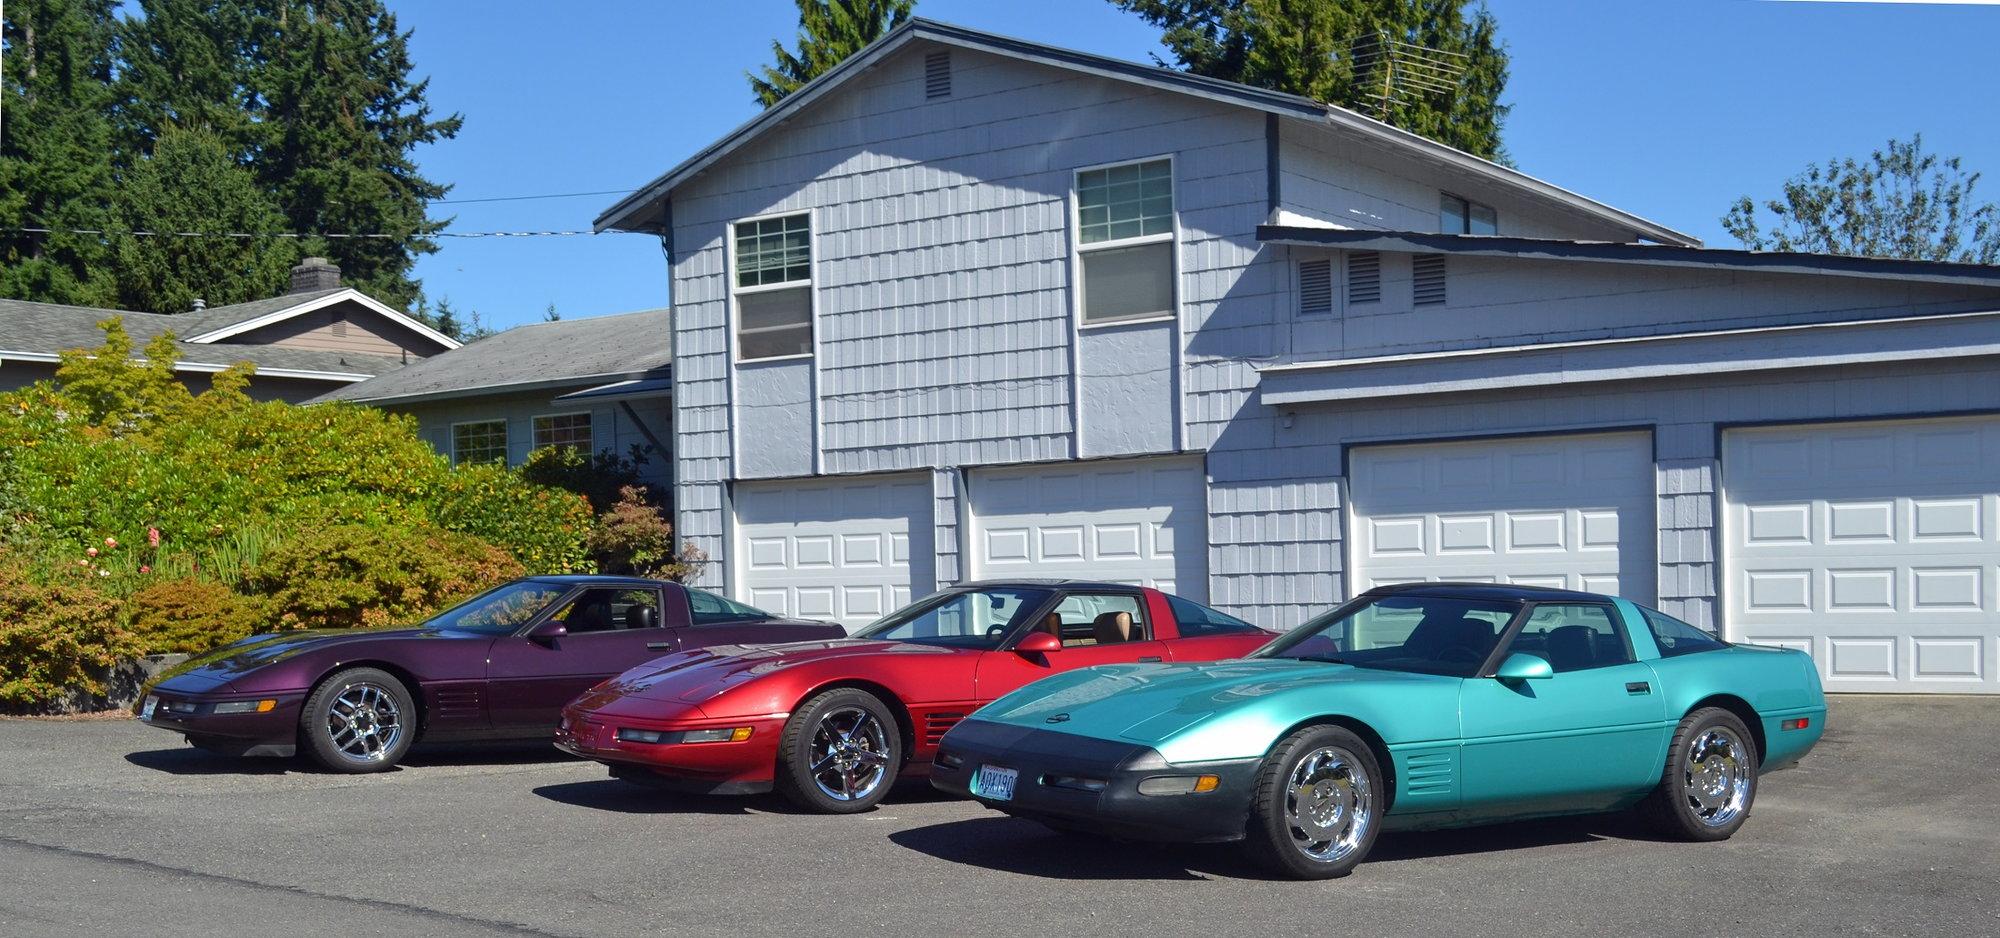 My 3 favorite c4 colors - CorvetteForum - Chevrolet Corvette